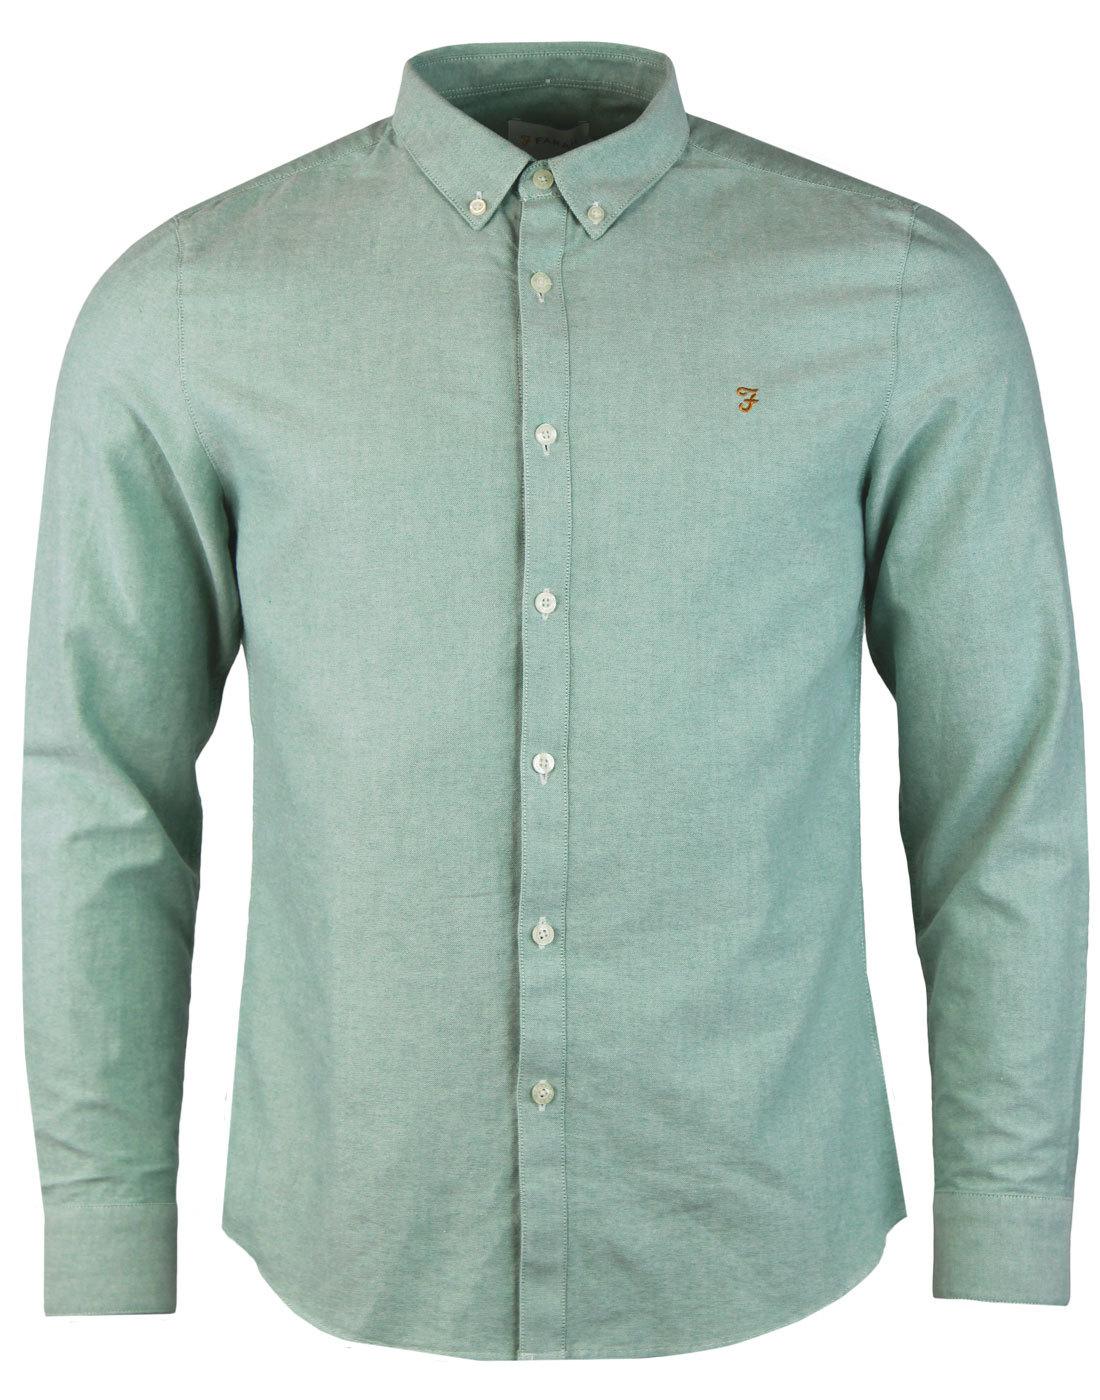 Brewer FARAH 1960s Mod Slim L/S Oxford Shirt PINE